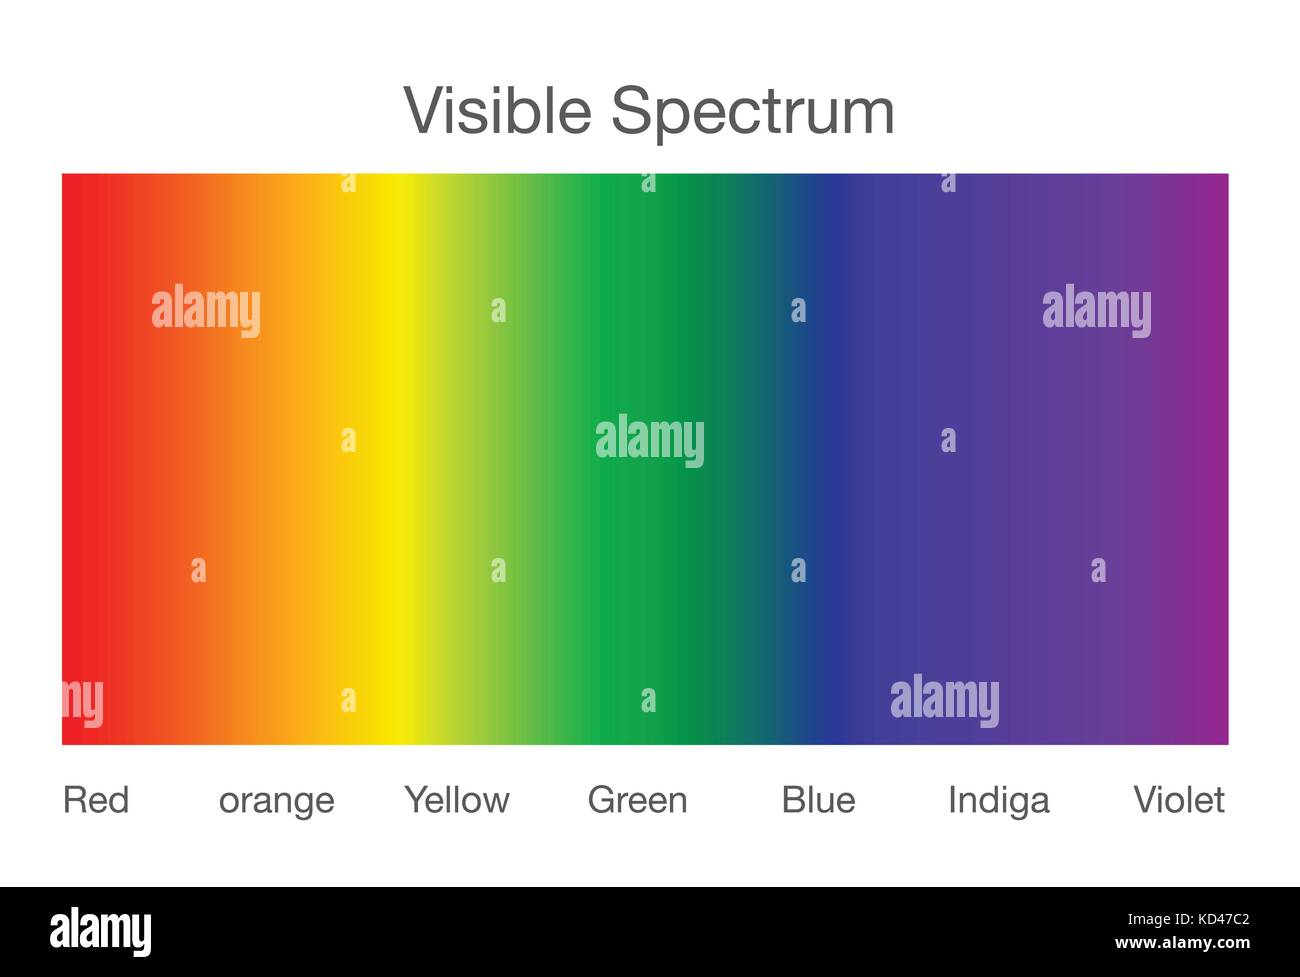 Visible spectrum of light. - Stock Vector